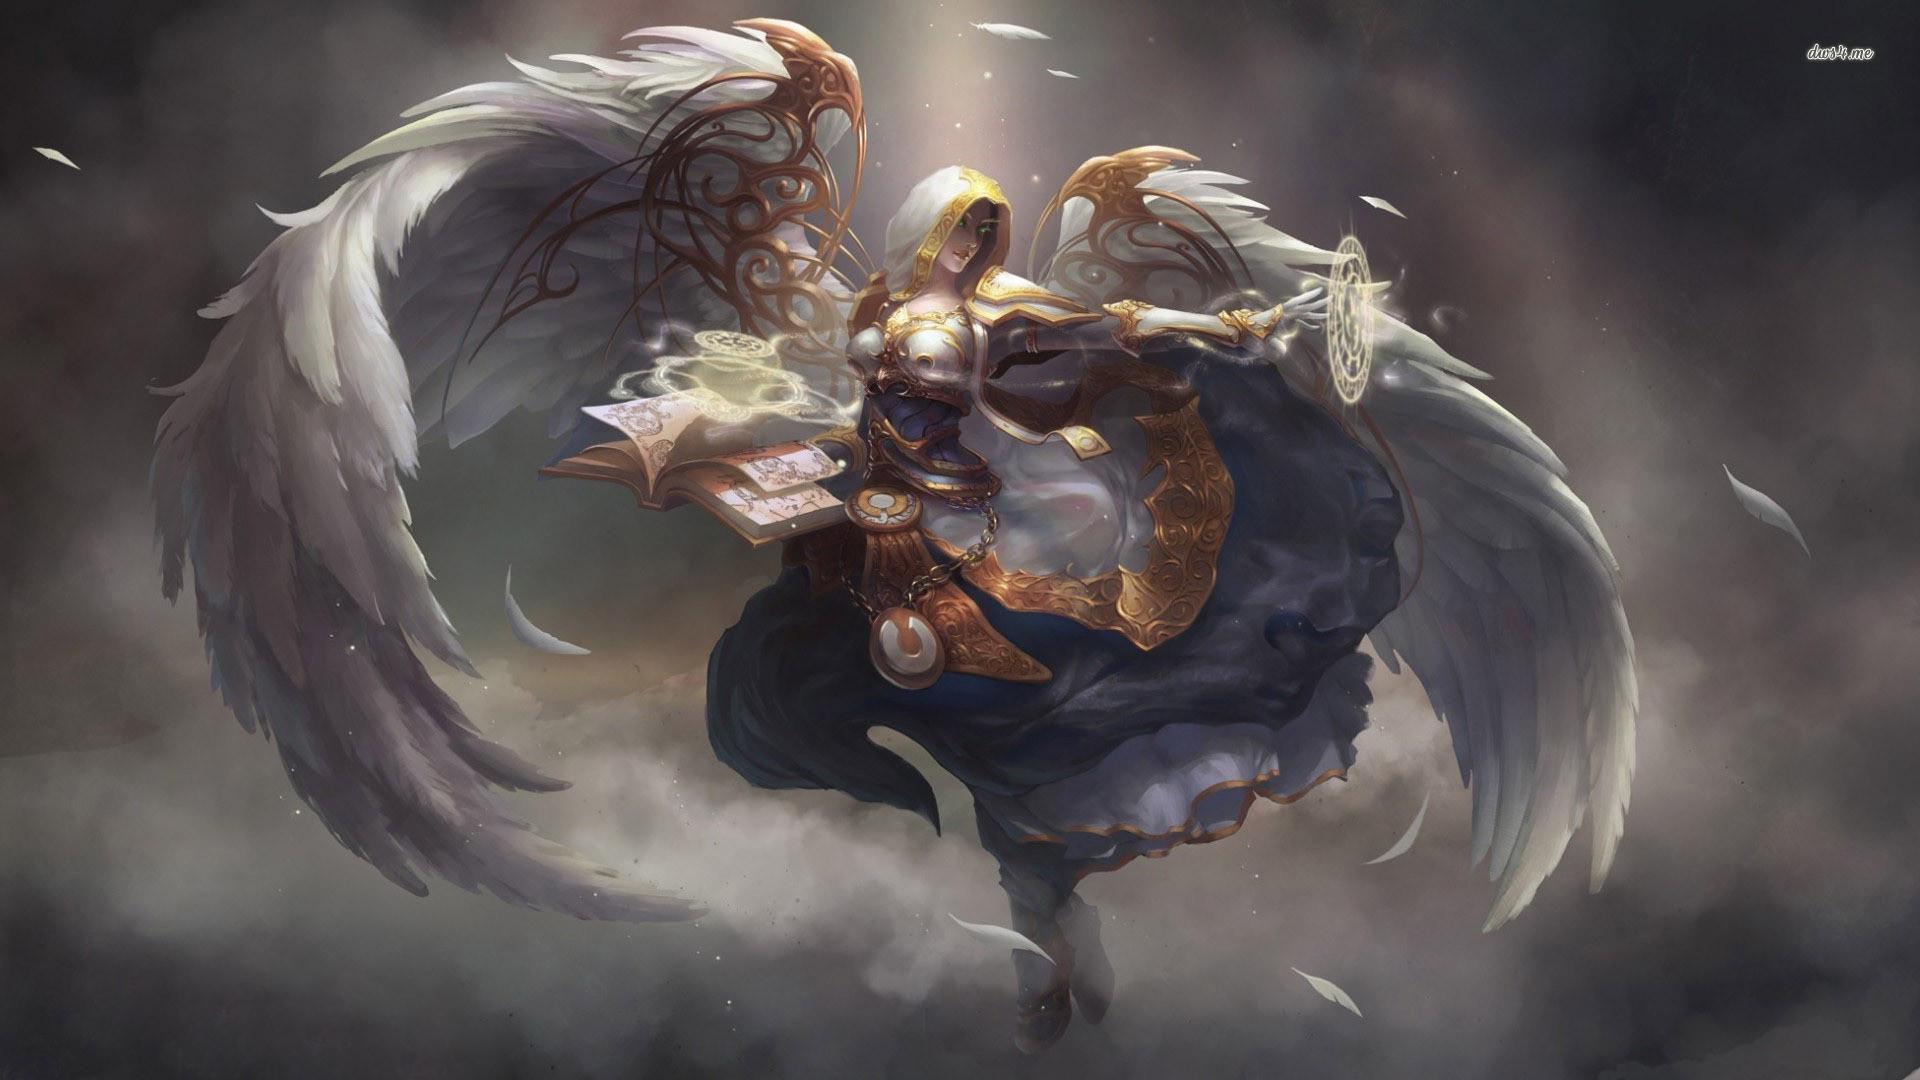 Best 20+ World of warcraft wallpaper ideas on Pinterest | World of  Warcraft, Warcraft art and Warcraft legion